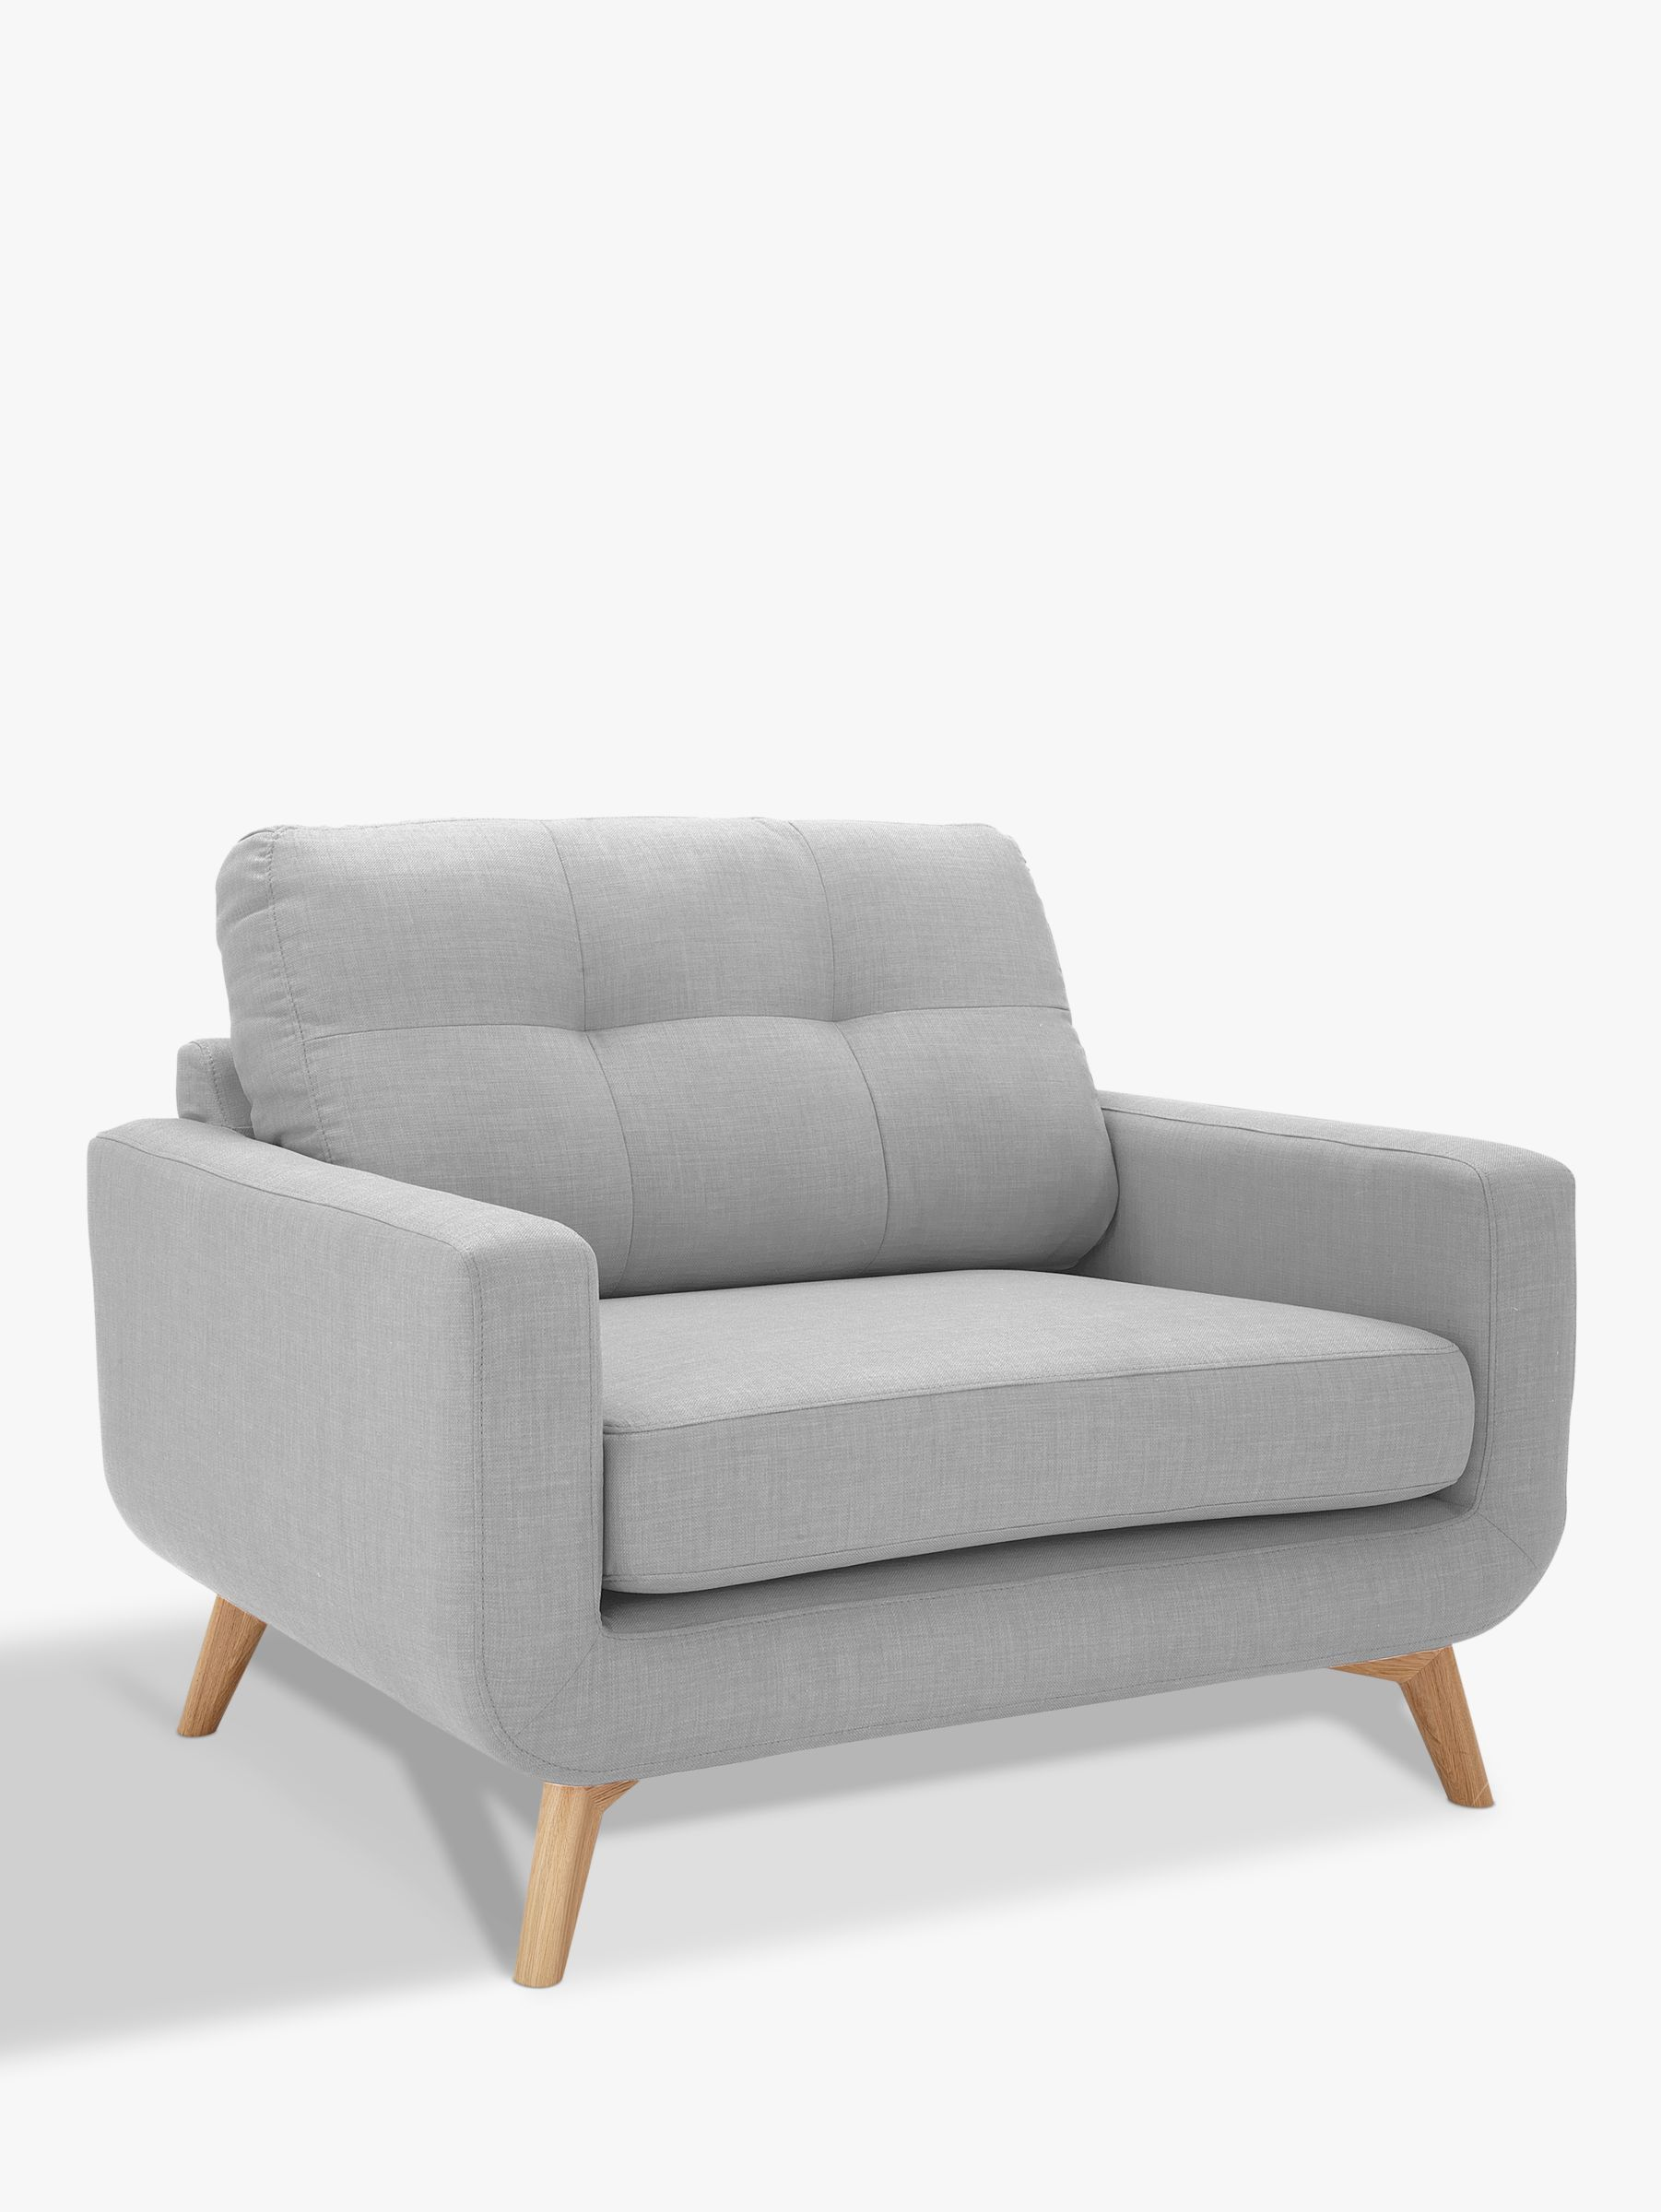 John Lewis Partners Barbican Snuggler Design Your Own Home 2 Seater Sofa Furniture